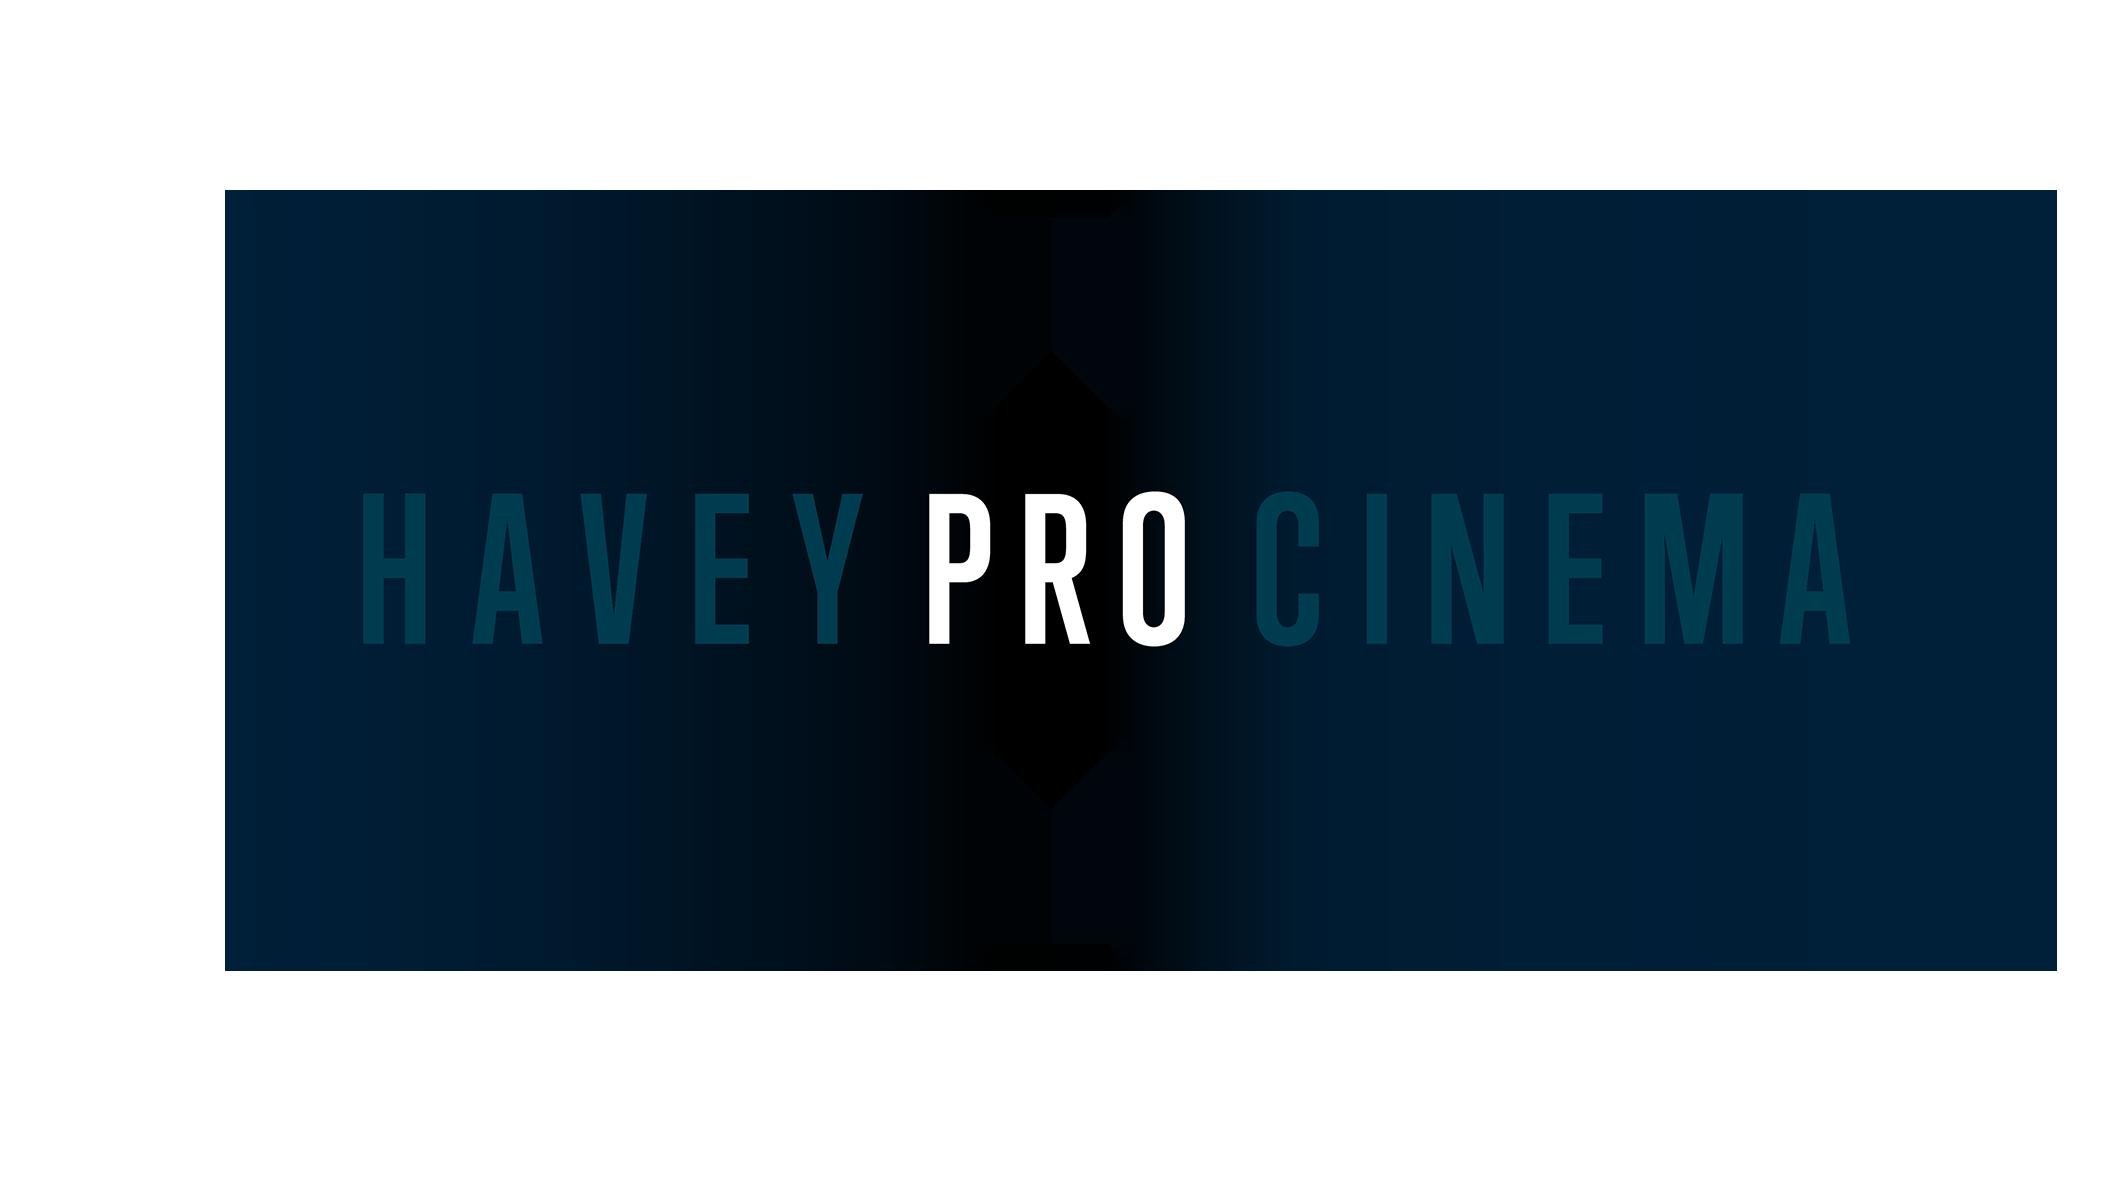 http://www.haveypro.com/